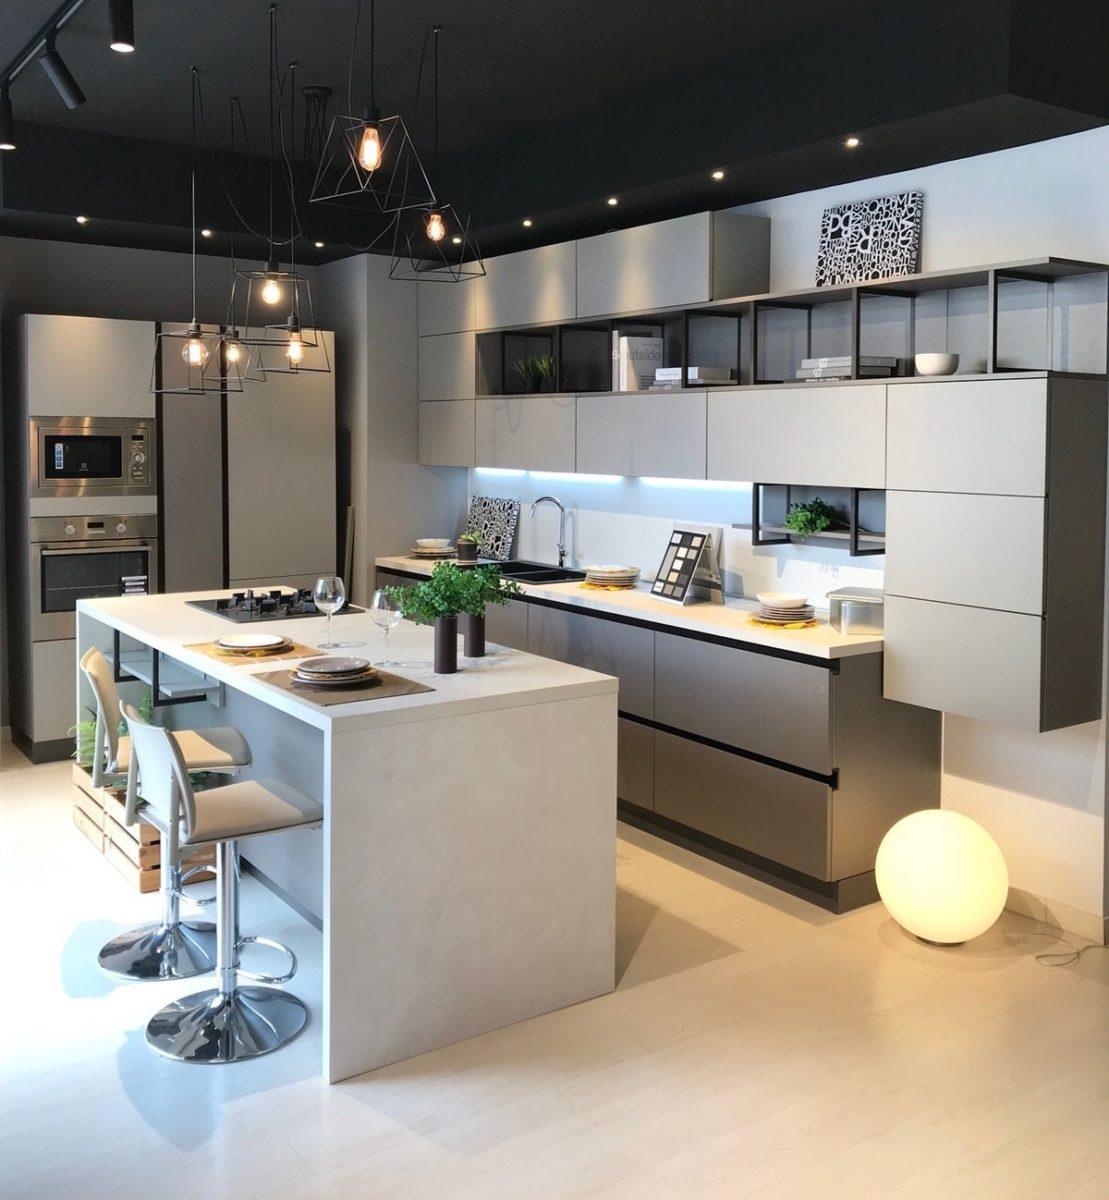 idee-cucina-domotica-isola6